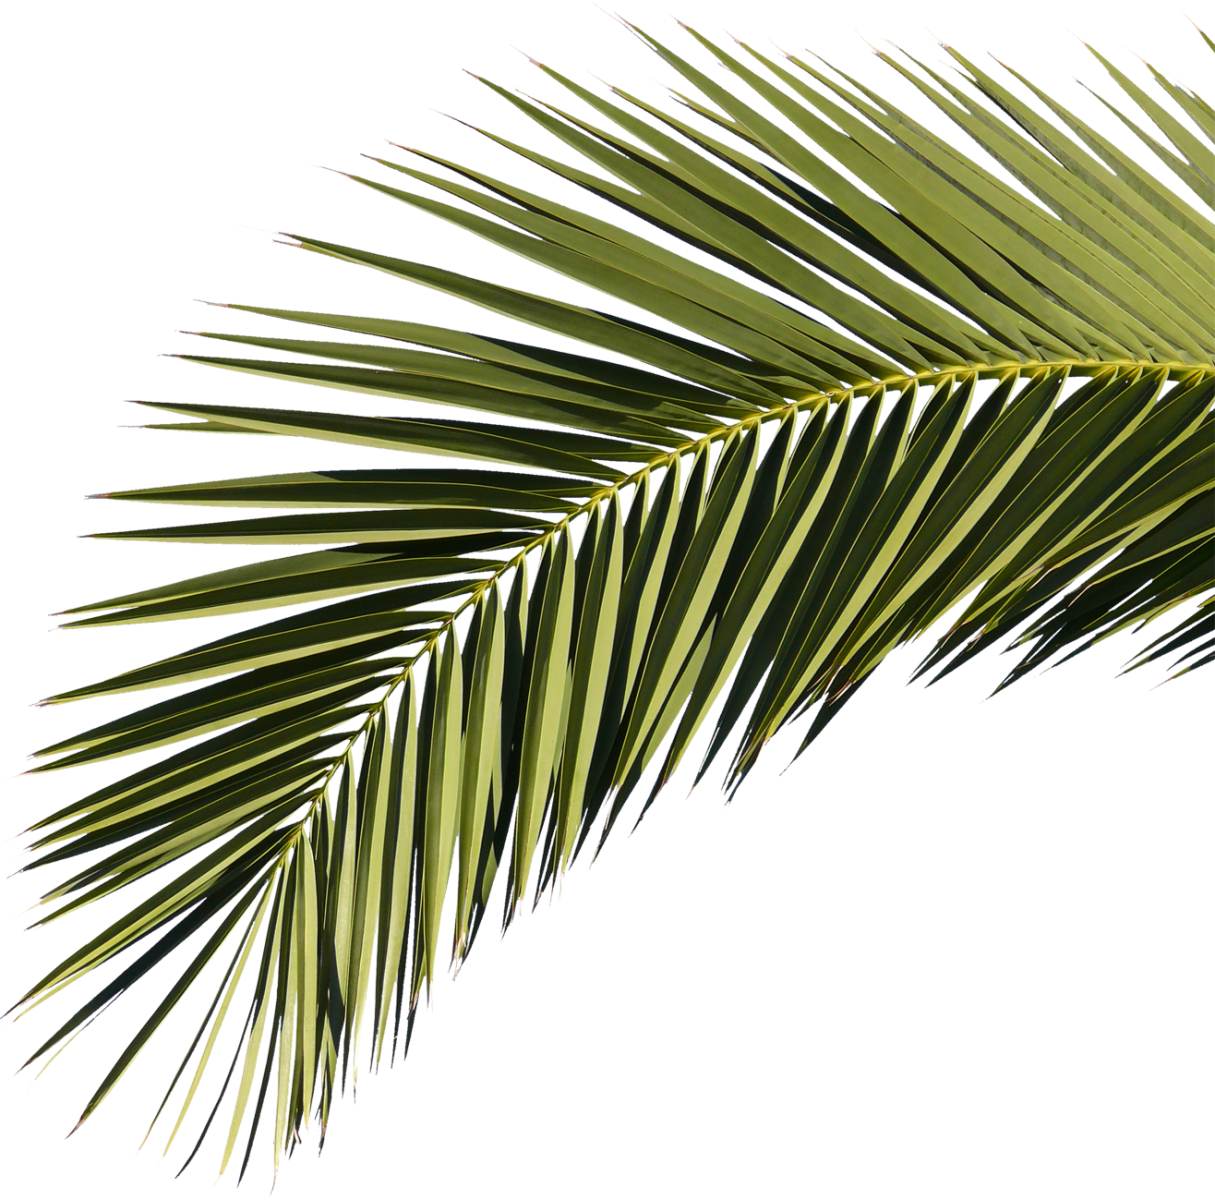 Palm Fronds Png, Transparent Png.